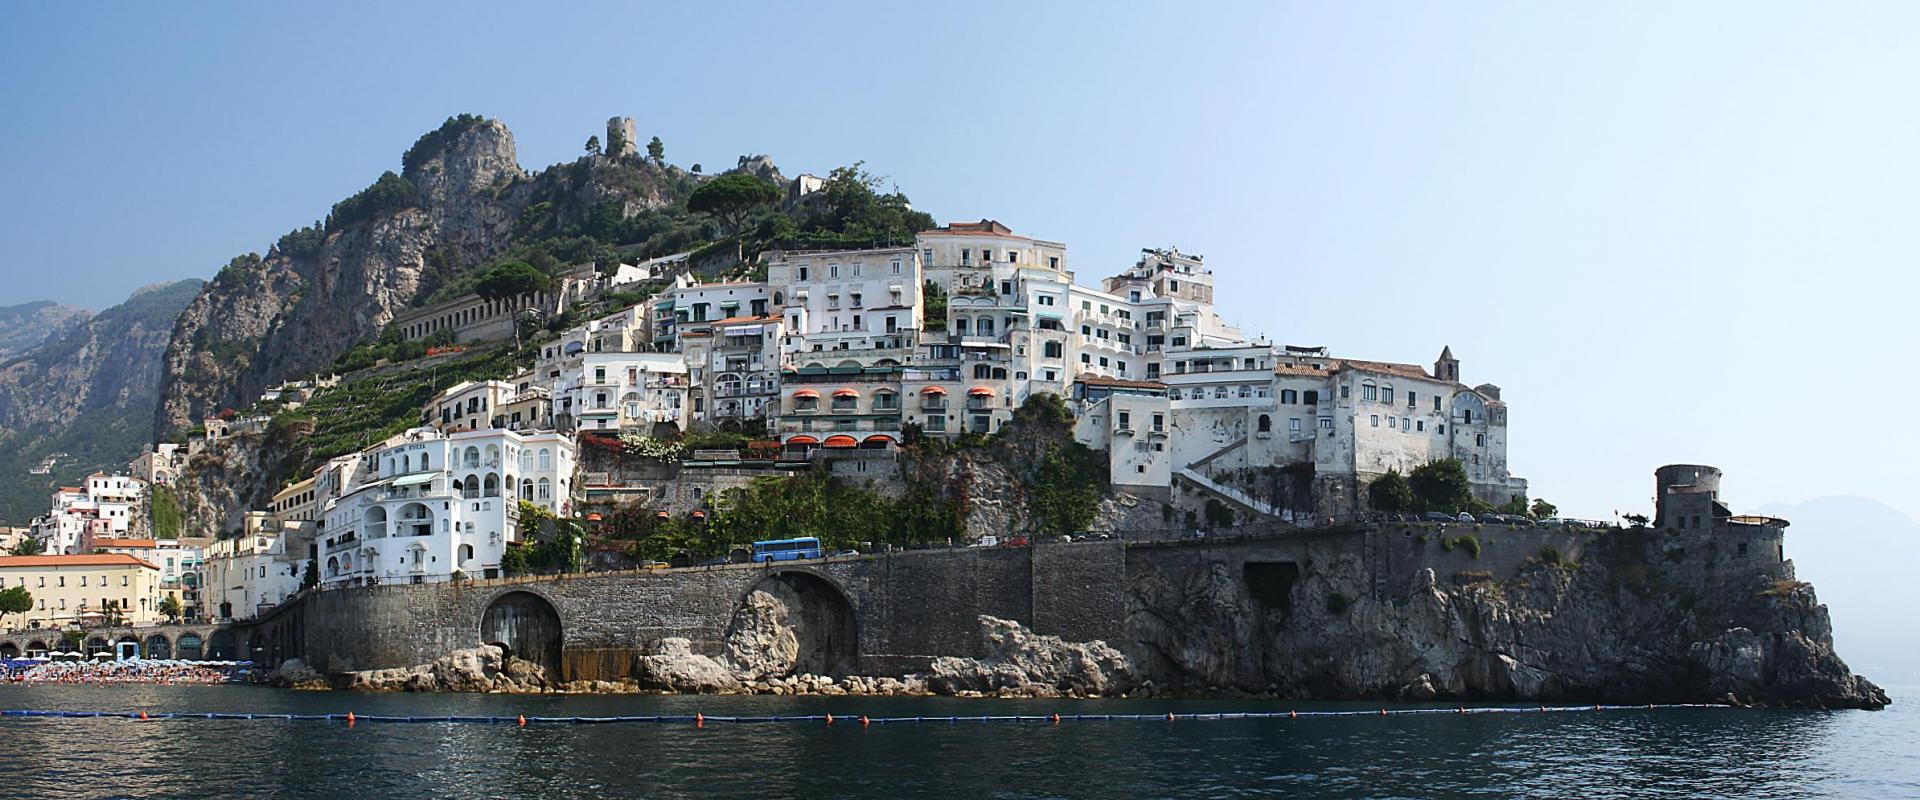 Tour Amalfi and Cilento Coast shore excursion